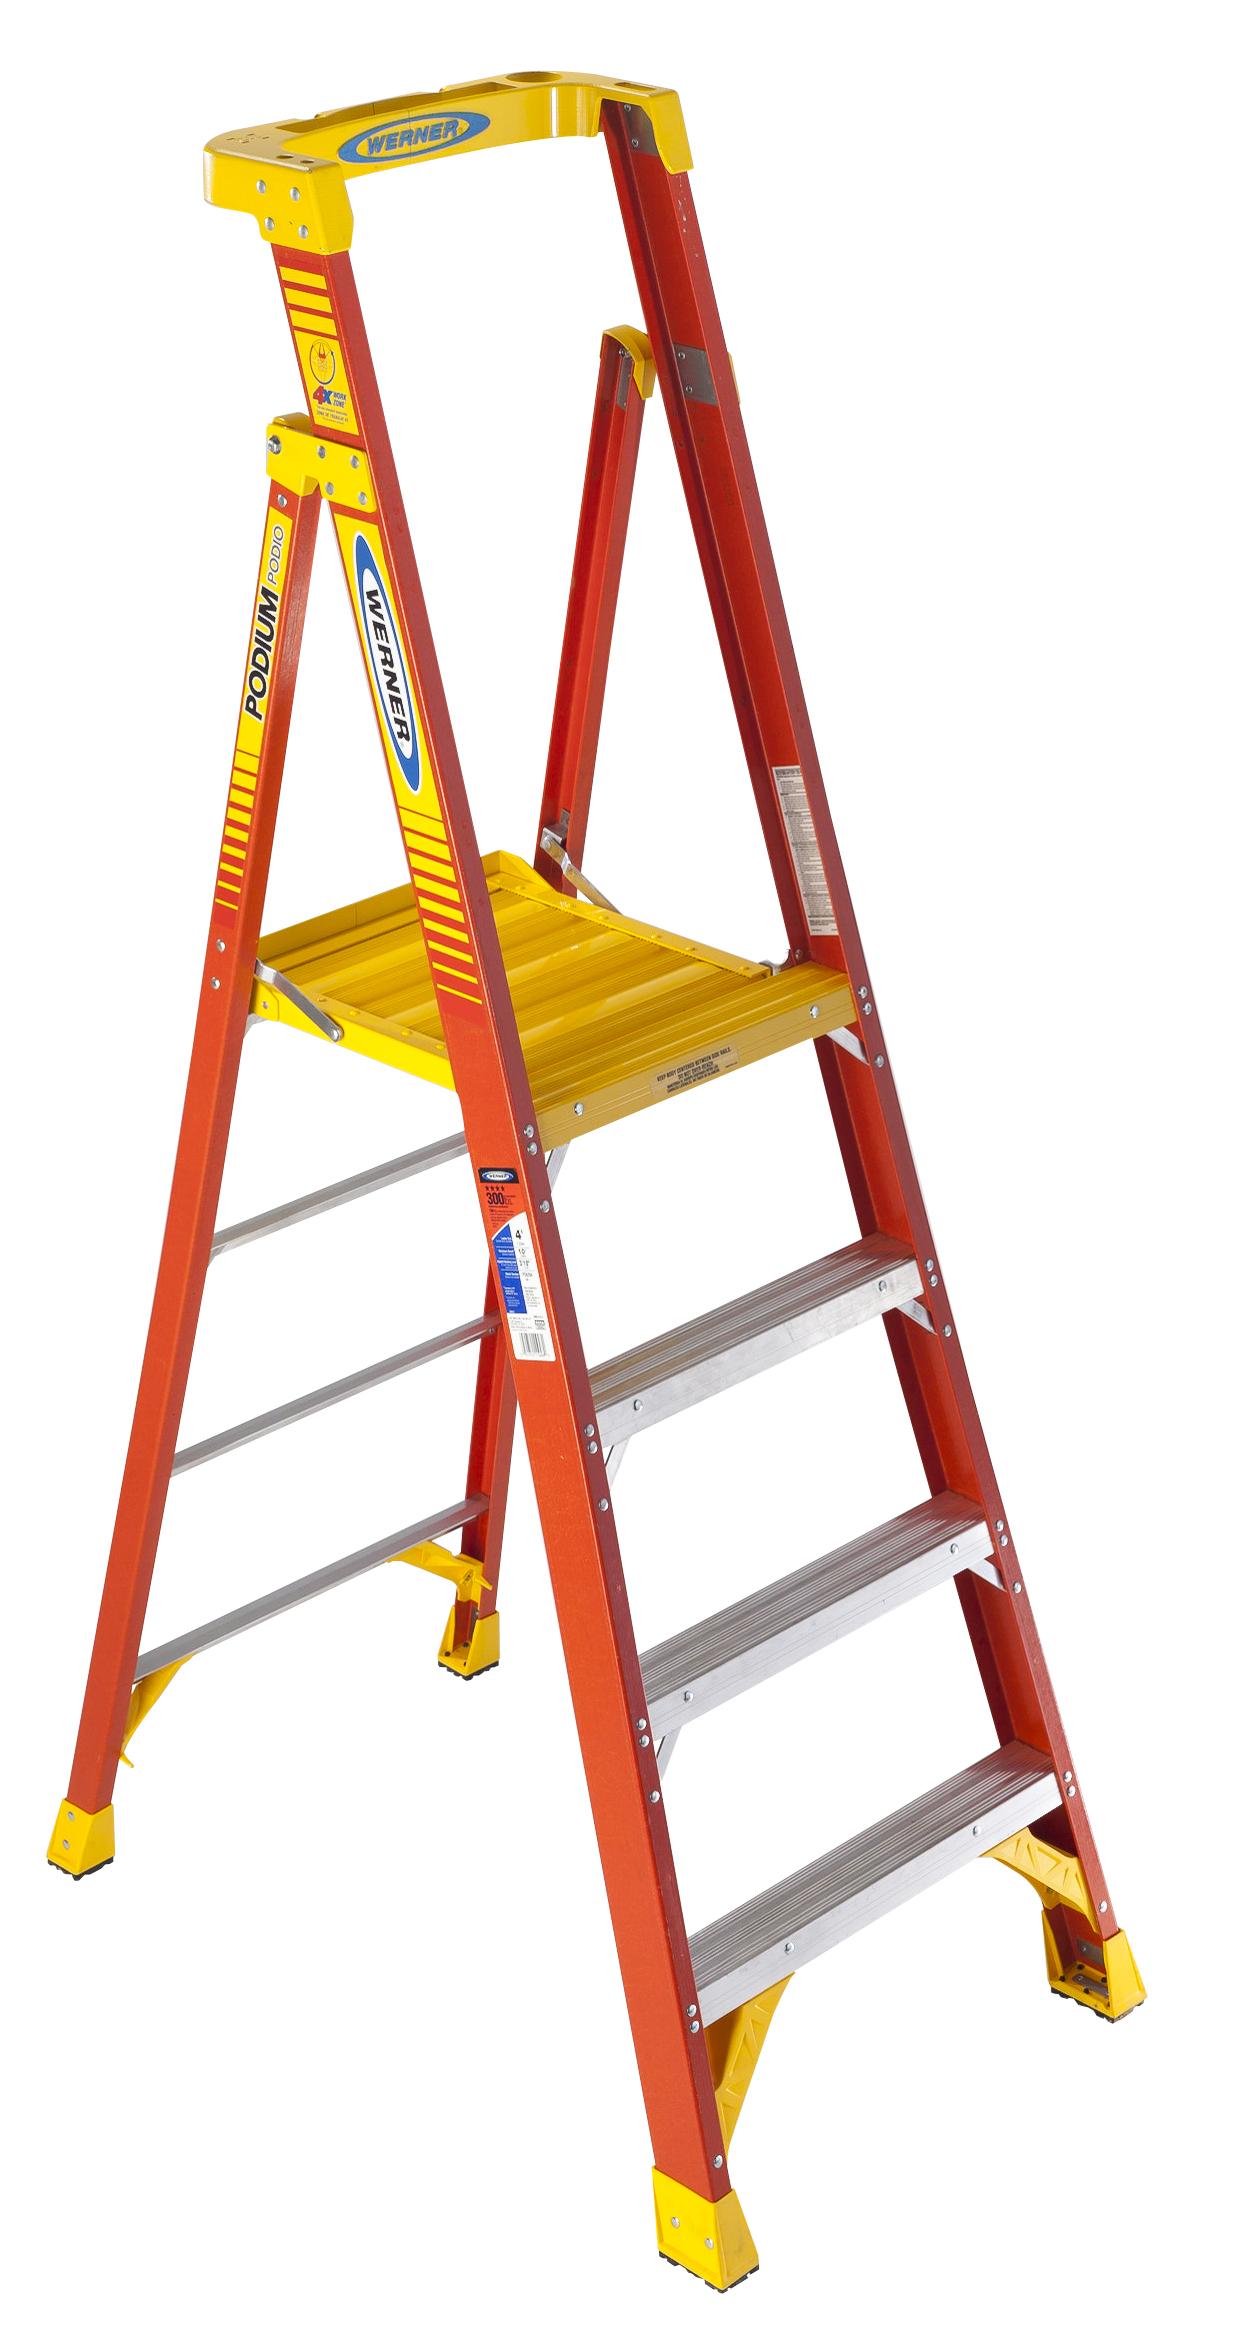 Werner Podium Ladder Pd6200 3 10